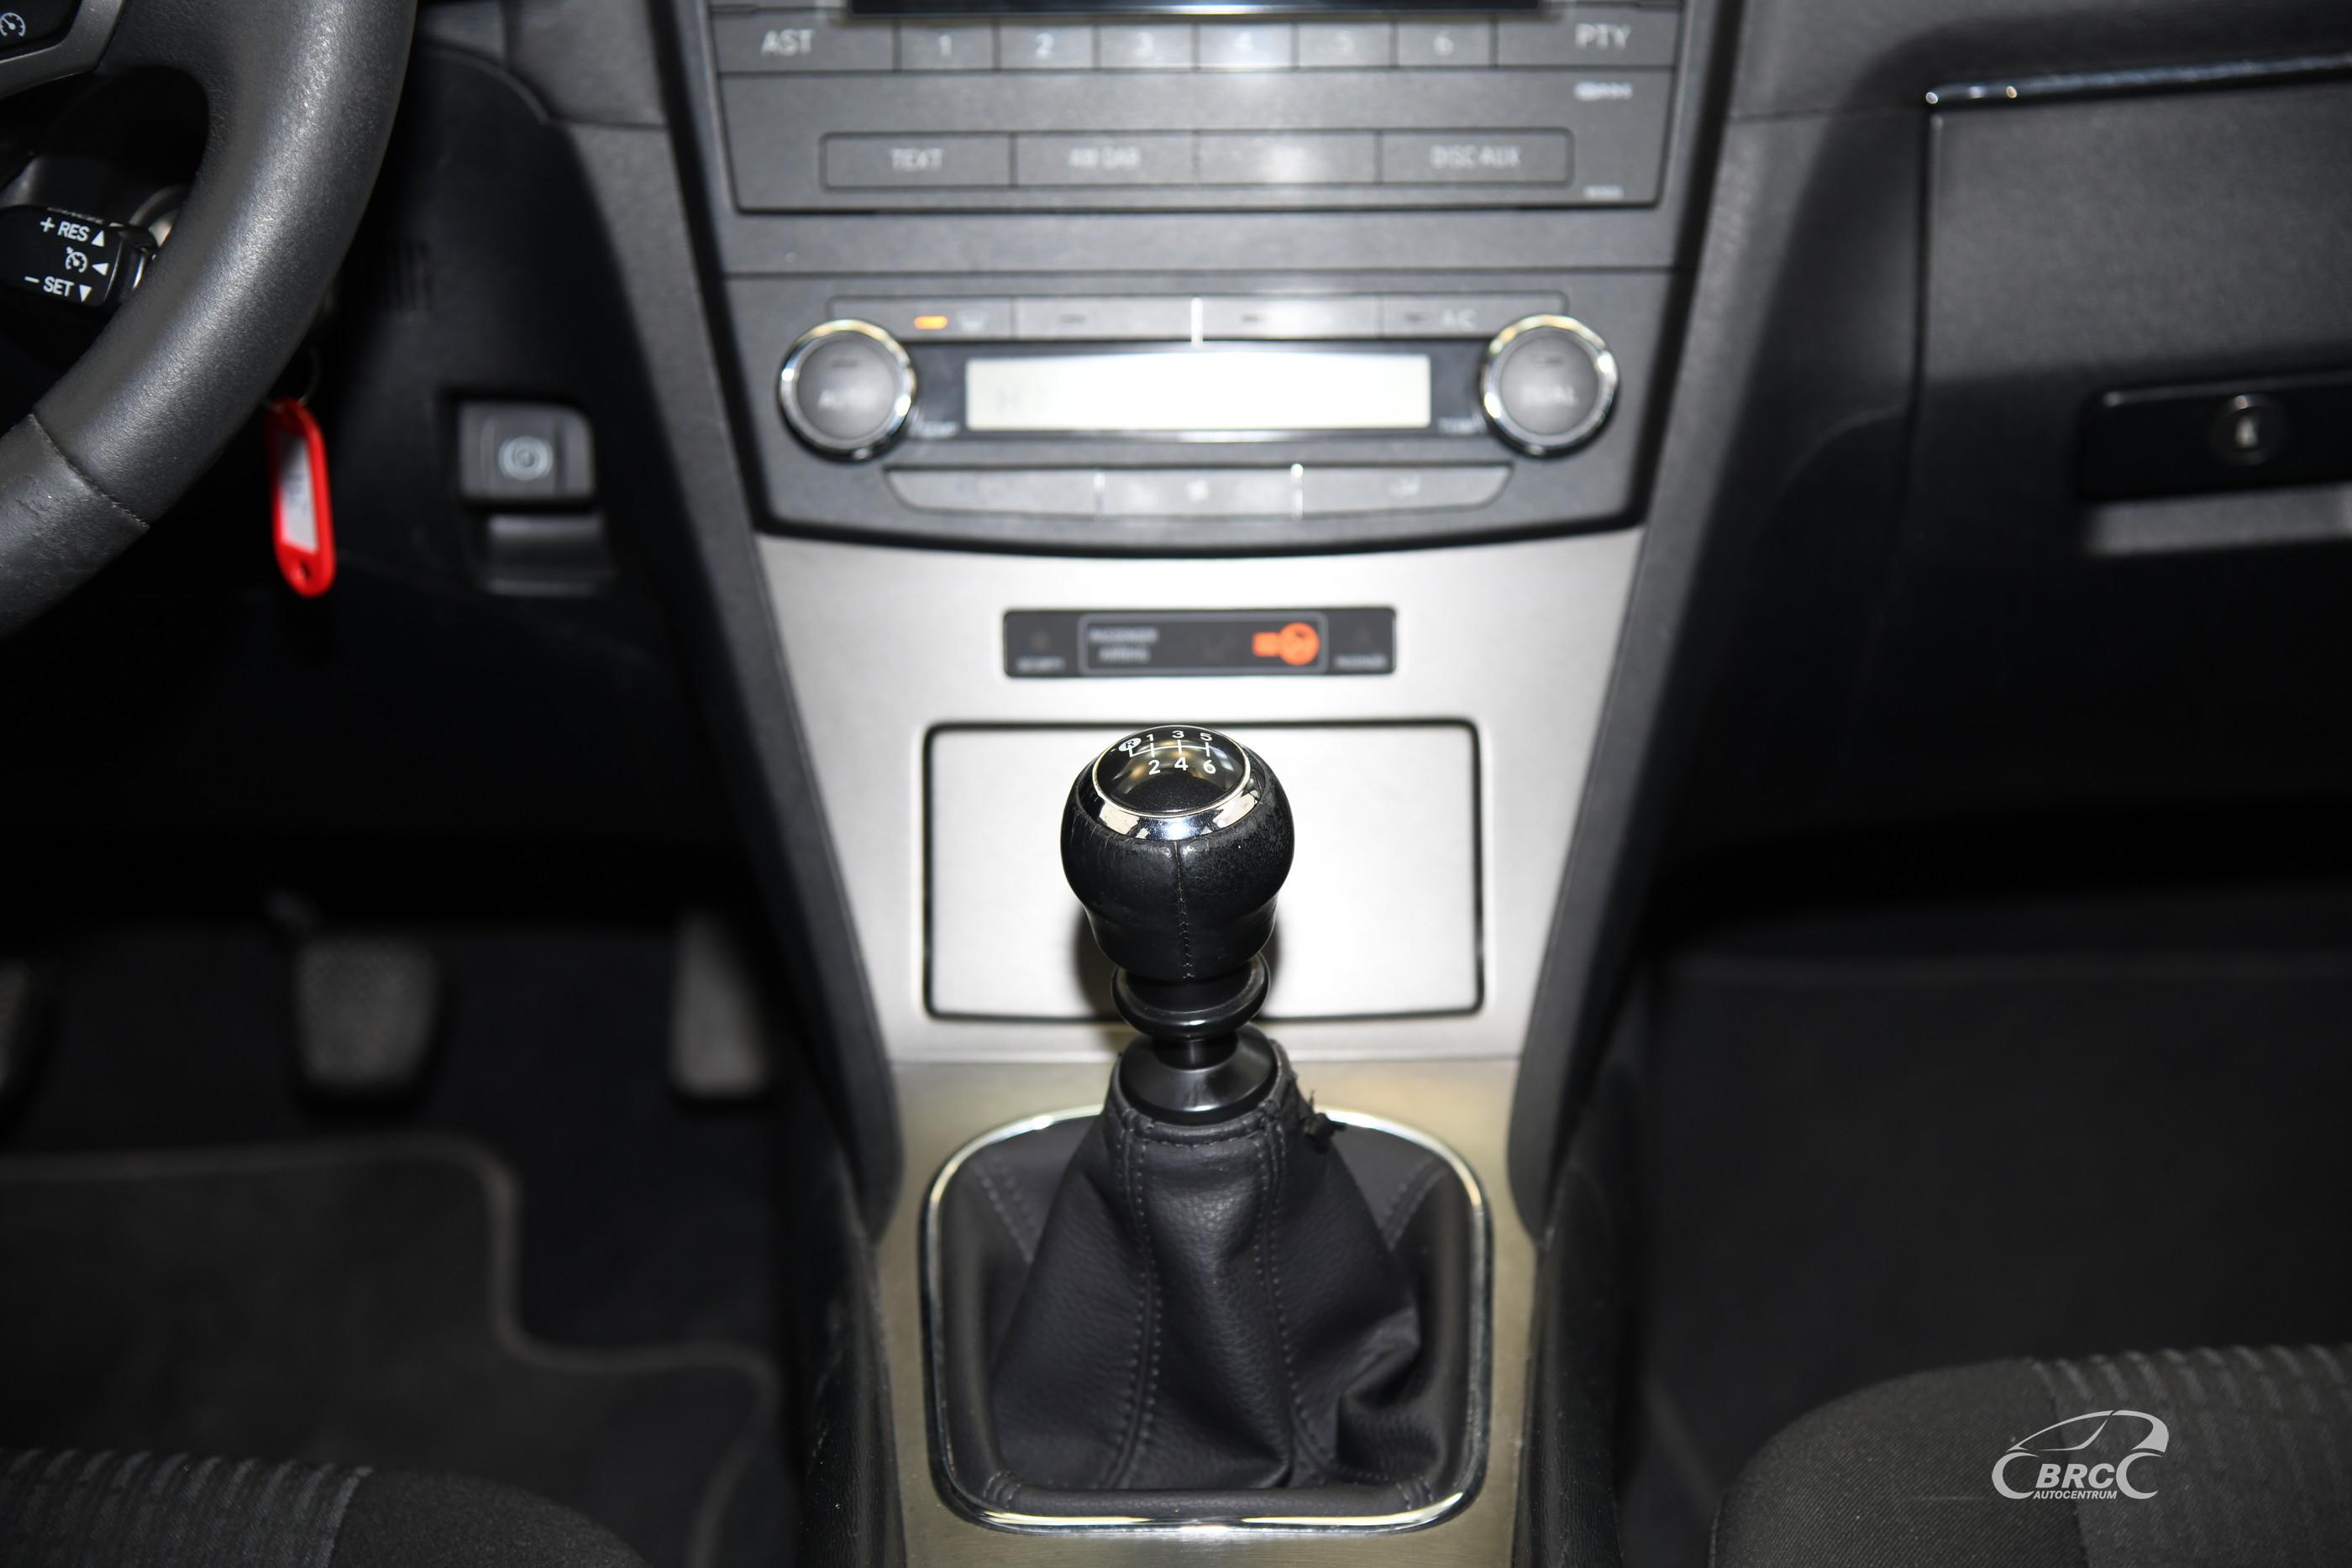 Toyota Avensis 2.0 D-4D Luna